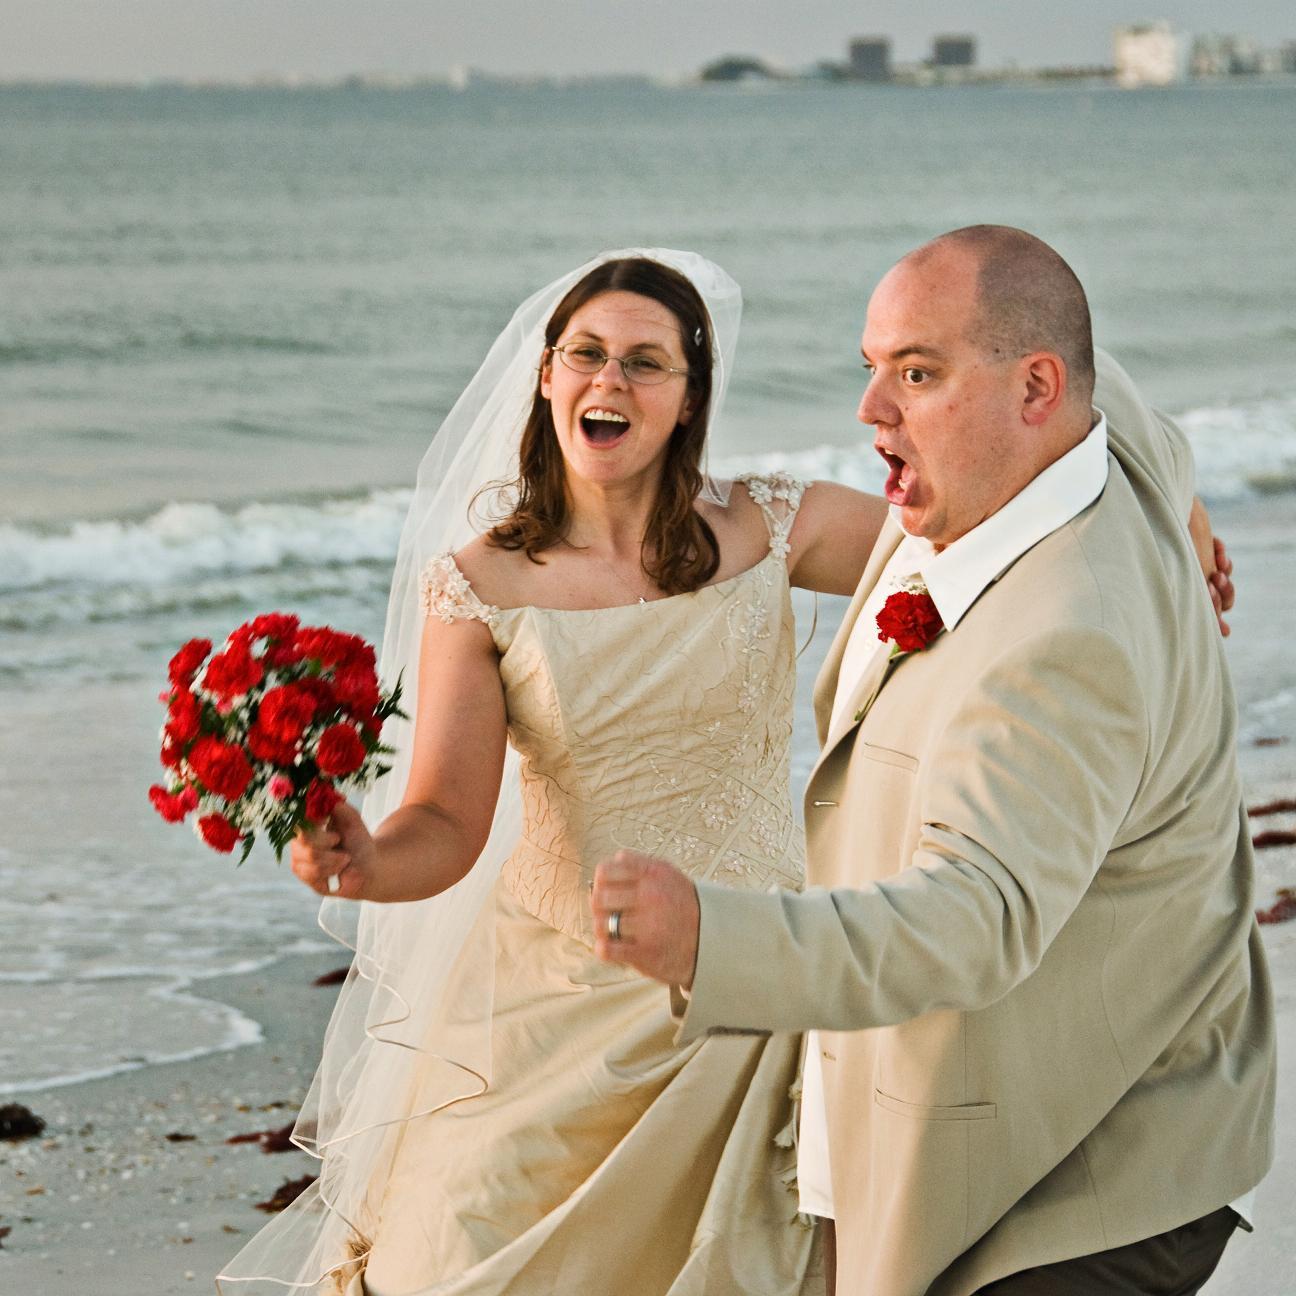 Wedding Photography, Clearwater Beach Weddings, Sand Key Beach Weddings, Indian Rocks Beach Weddings, Indian Shores Beach Weddings, Redington Shores Beach Weddings, Madeira Beach Weddings, Treasure Island Beach Weddings, St. Pete beach Weddings